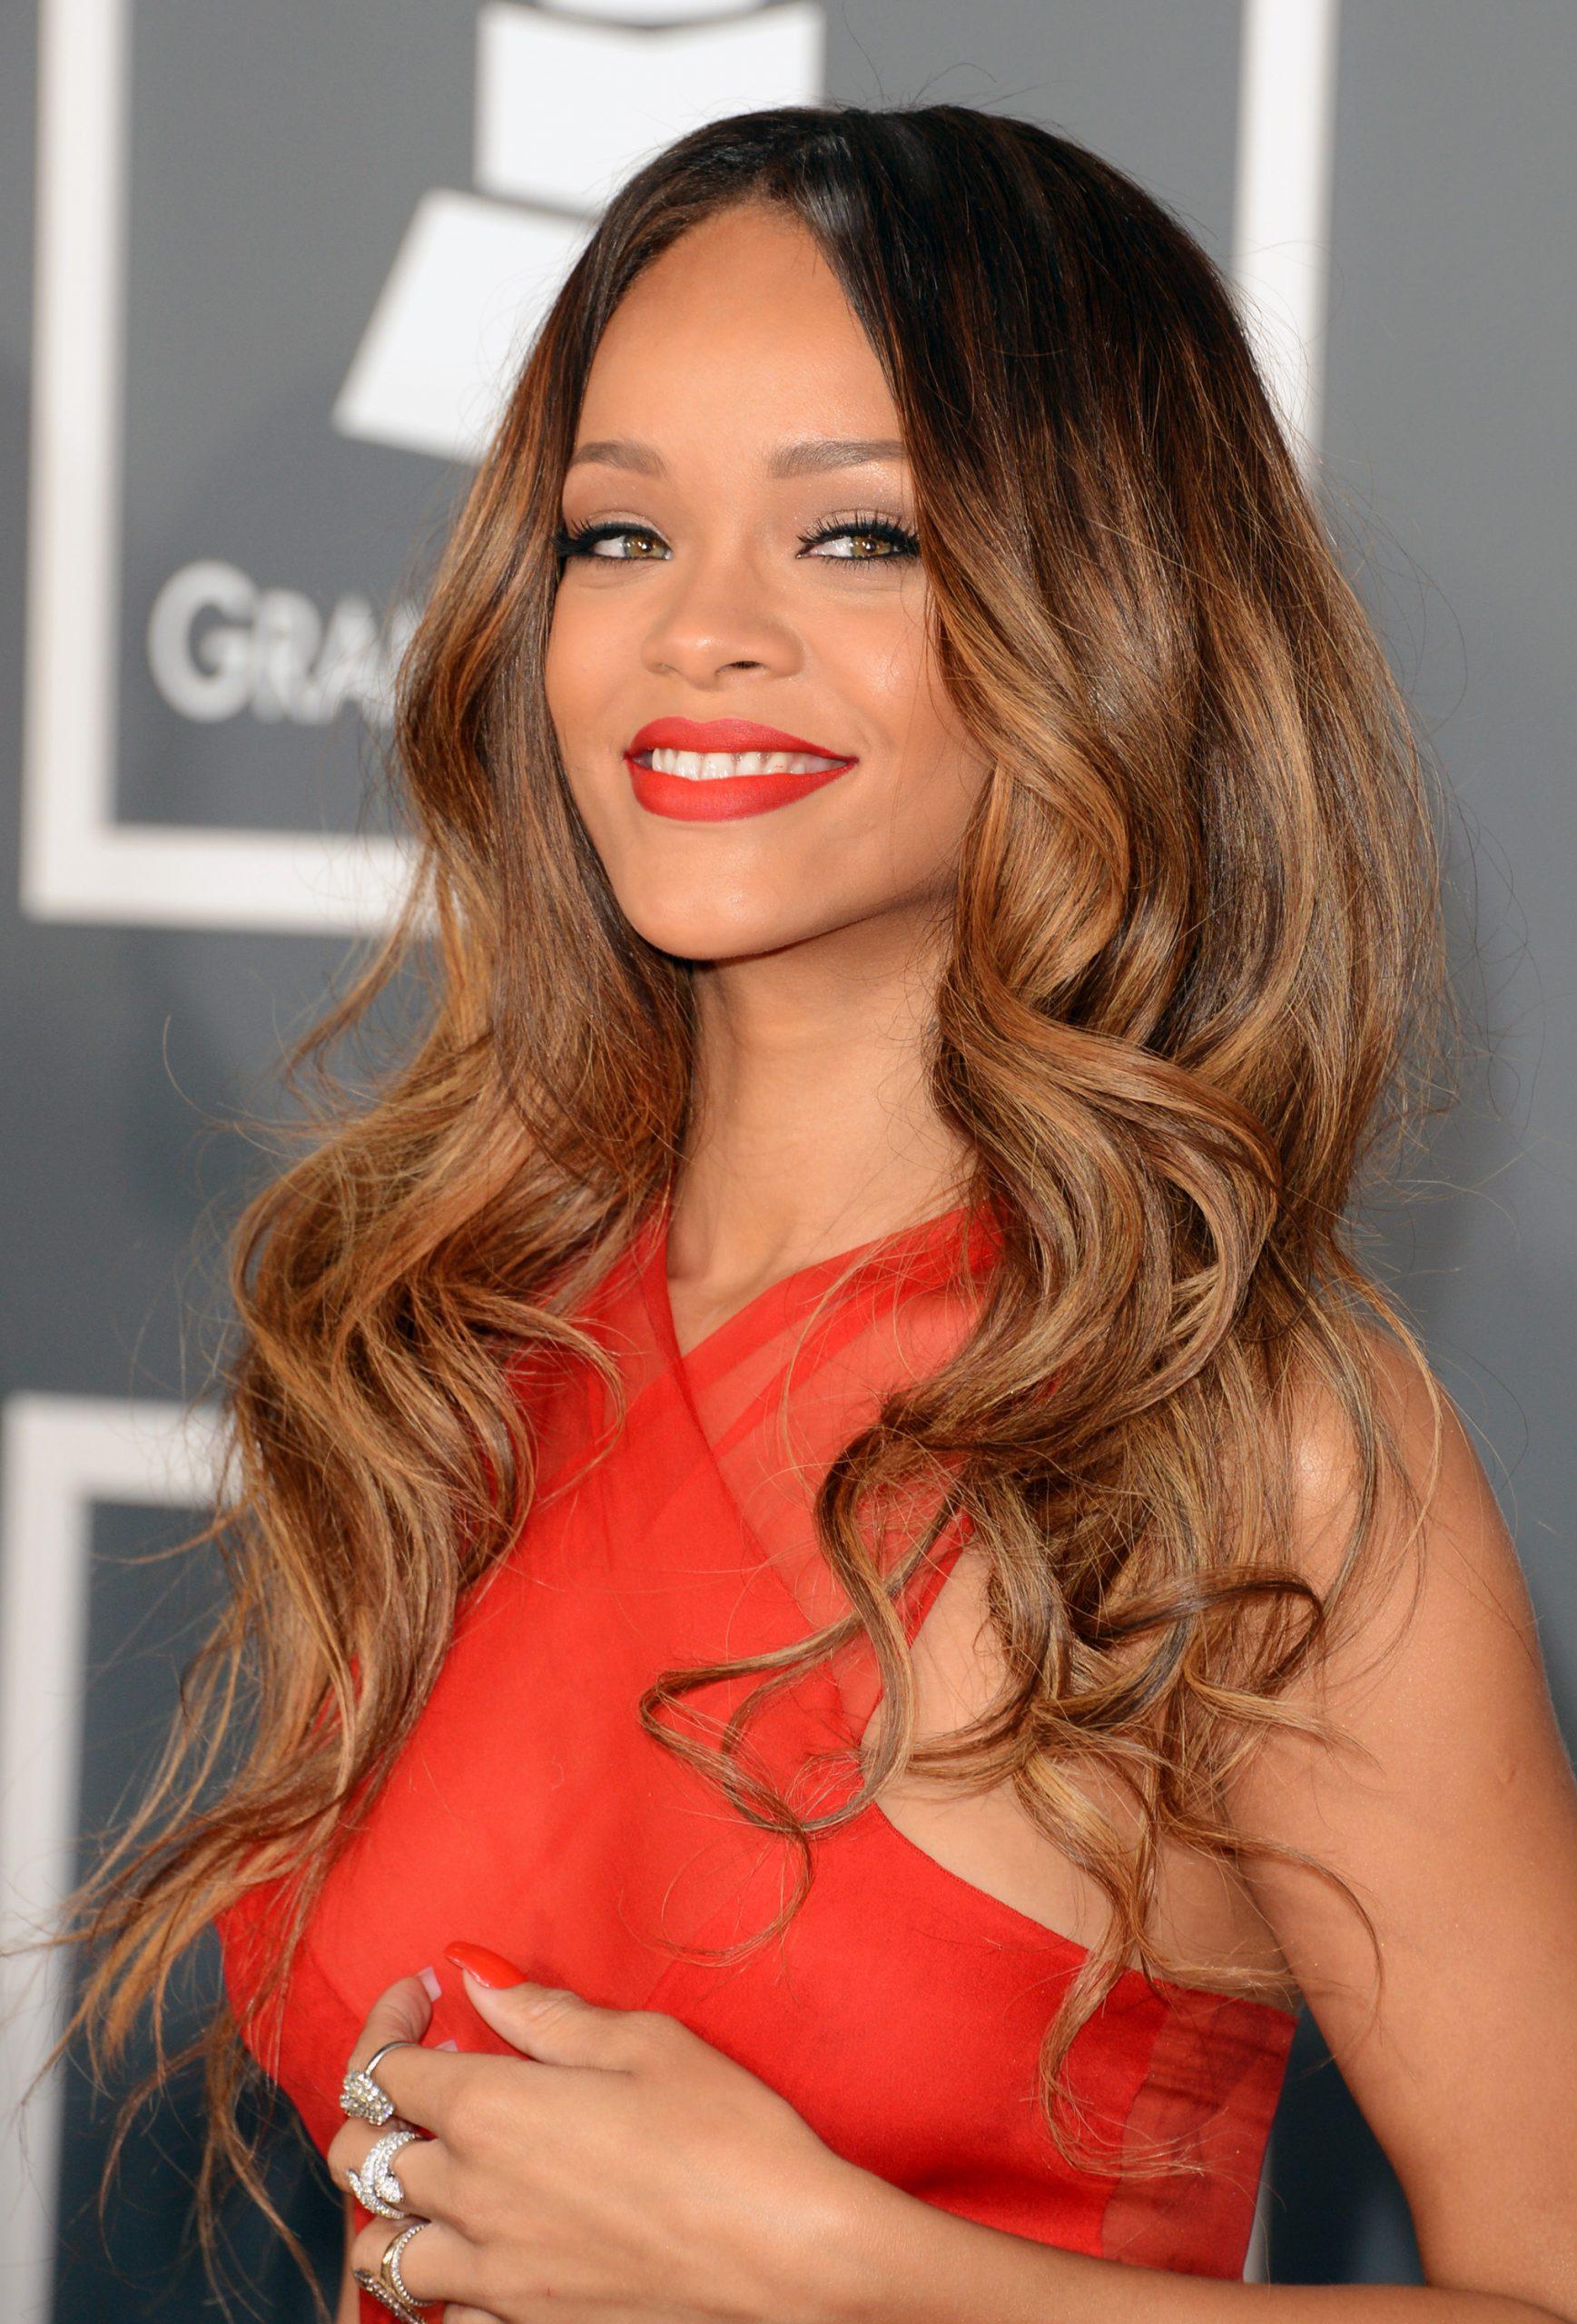 Before: Rihanna